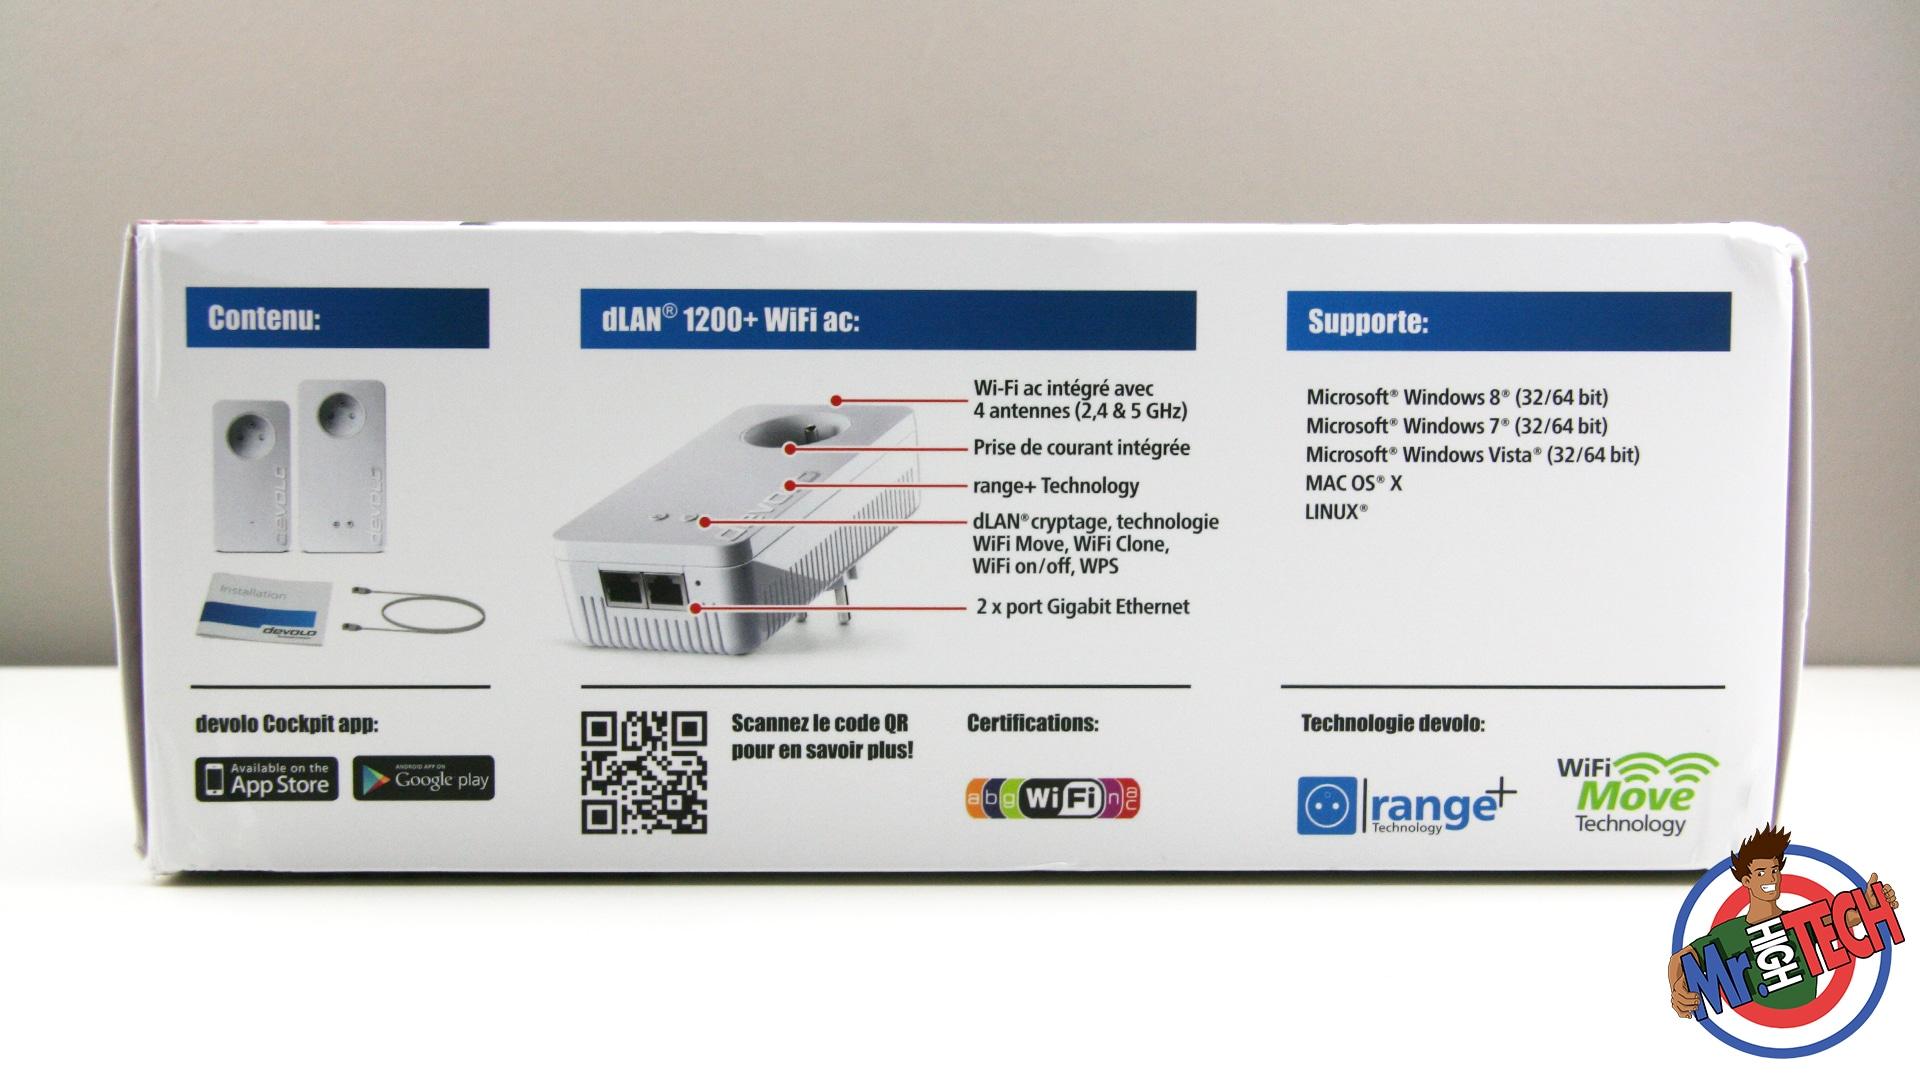 Devolo dLAN 1200+ : Test du Kit Starter WiFi Devolo et Avis ...